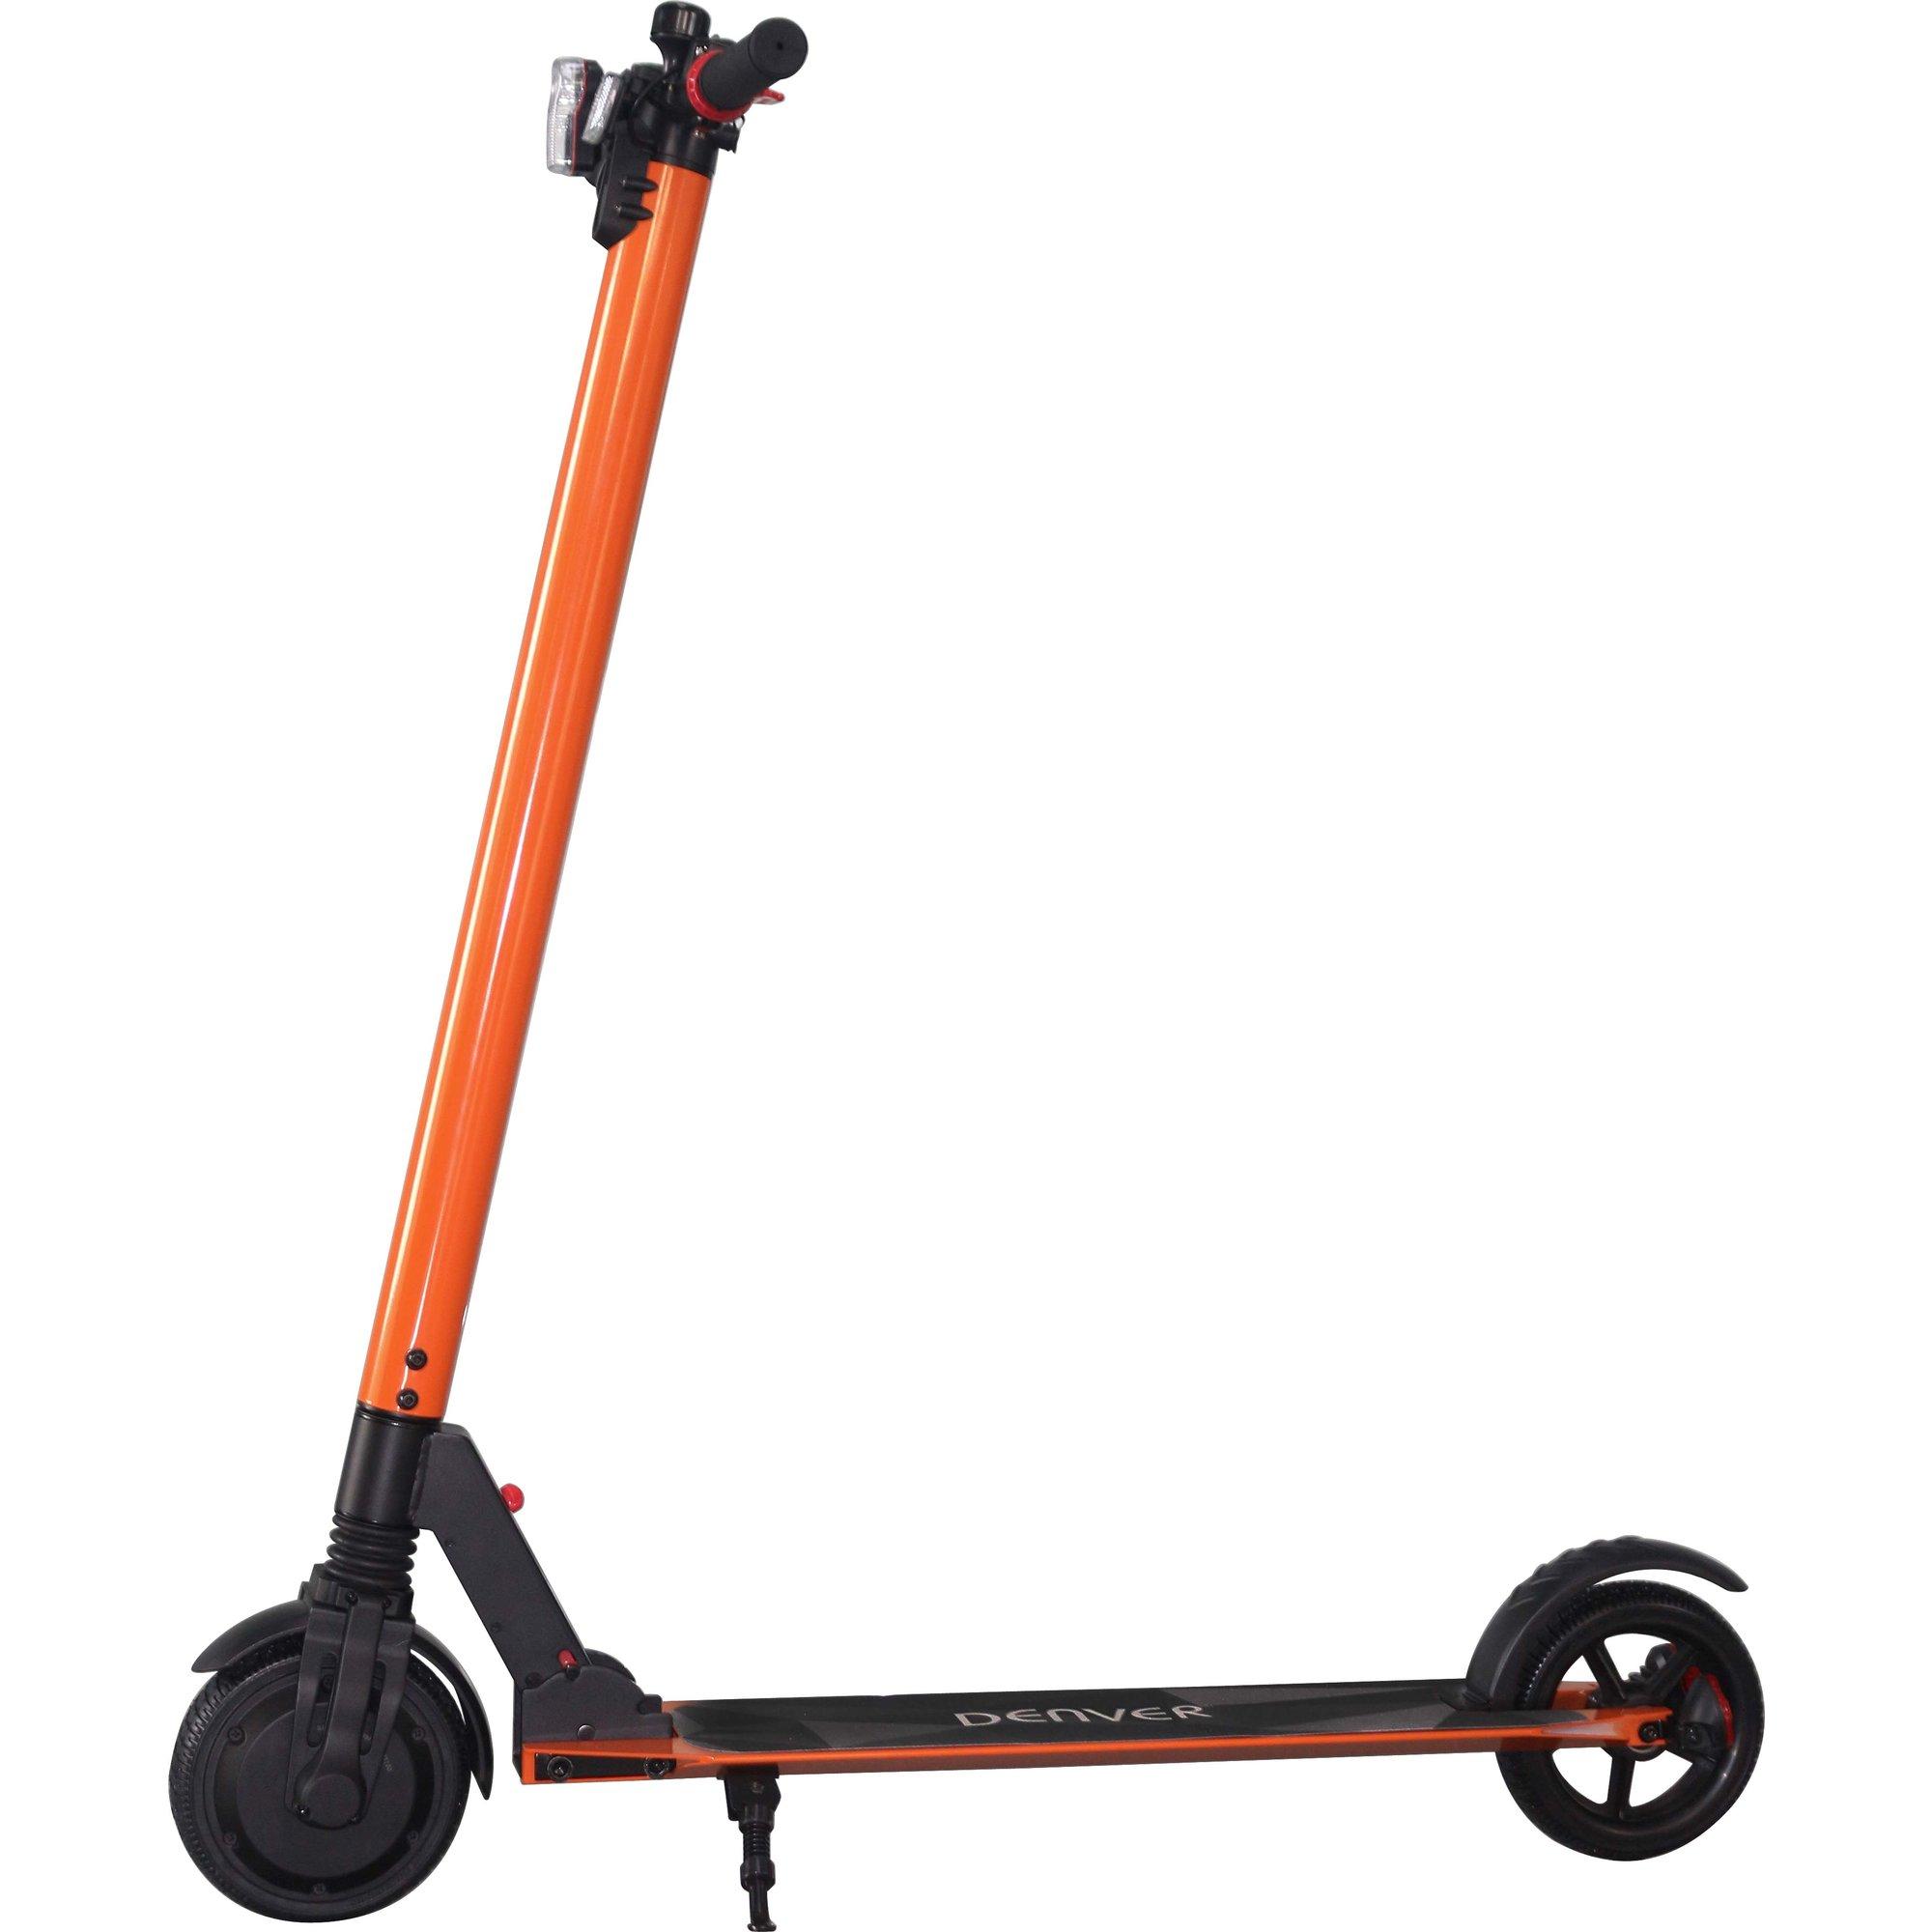 Denver SCO-65110 elektrisk scooter orange